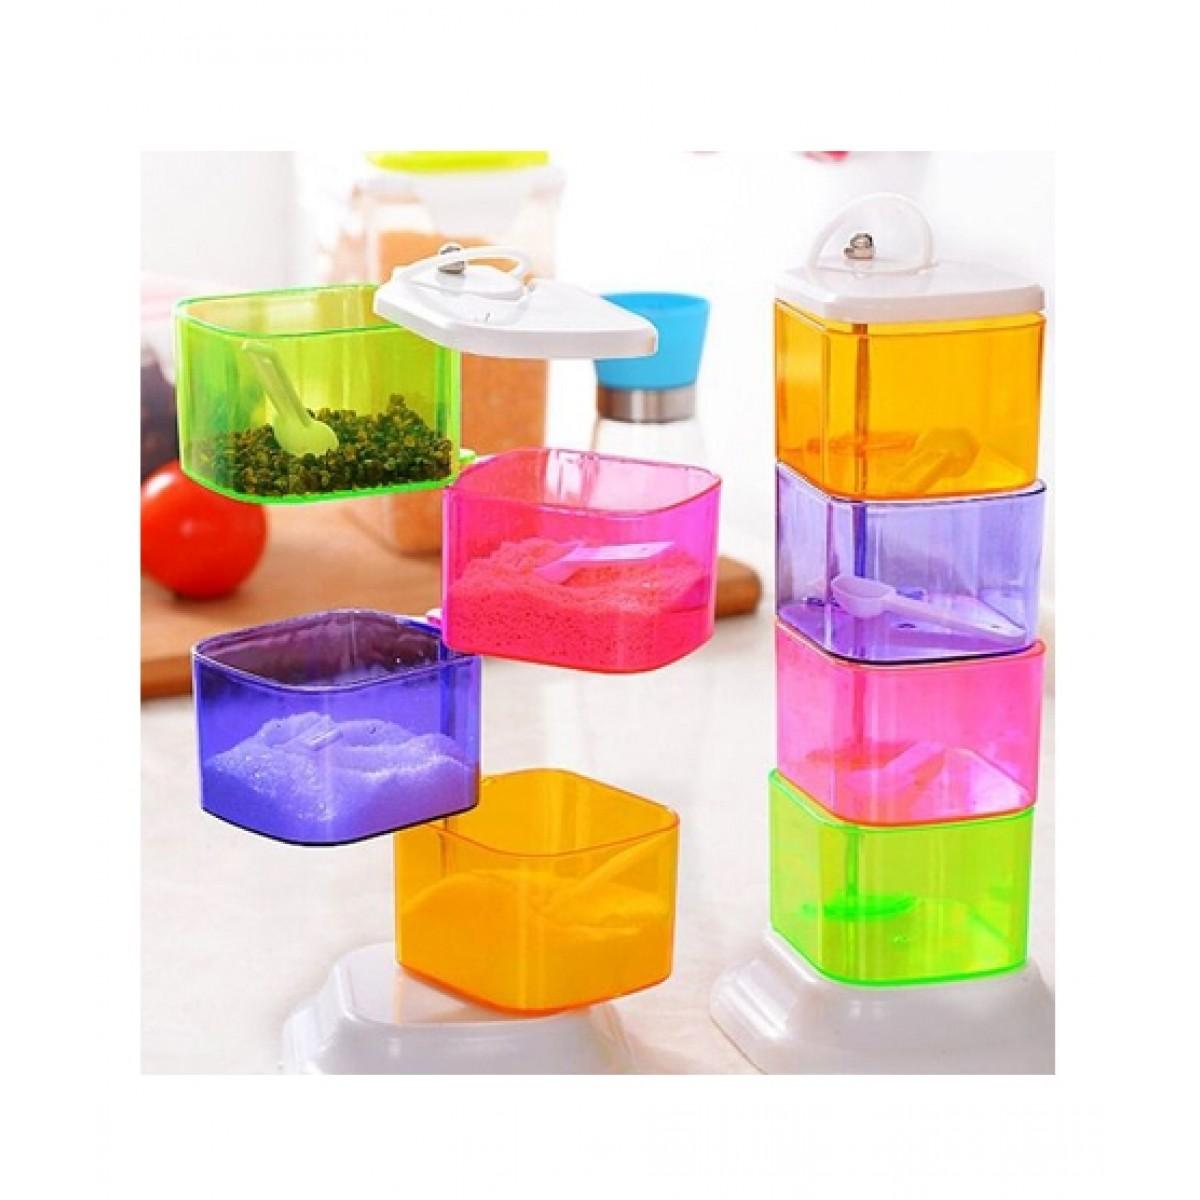 ShopInk Vertical Seasoning Box 360 Degrees Rotary Spice Bottle Castor Jar